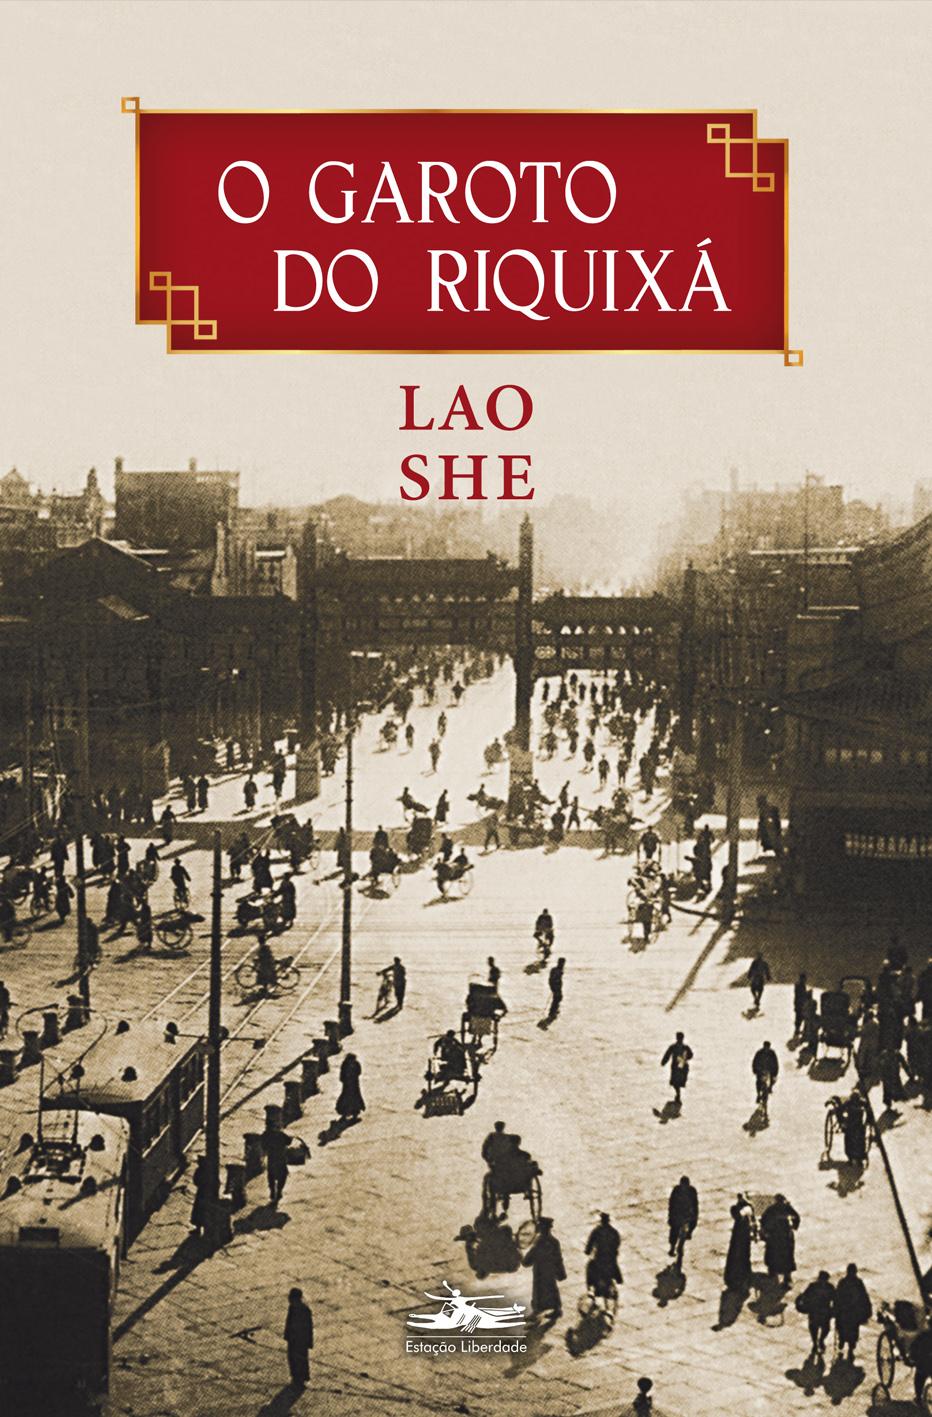 O Garoto do Riquixá, livro de Lao She